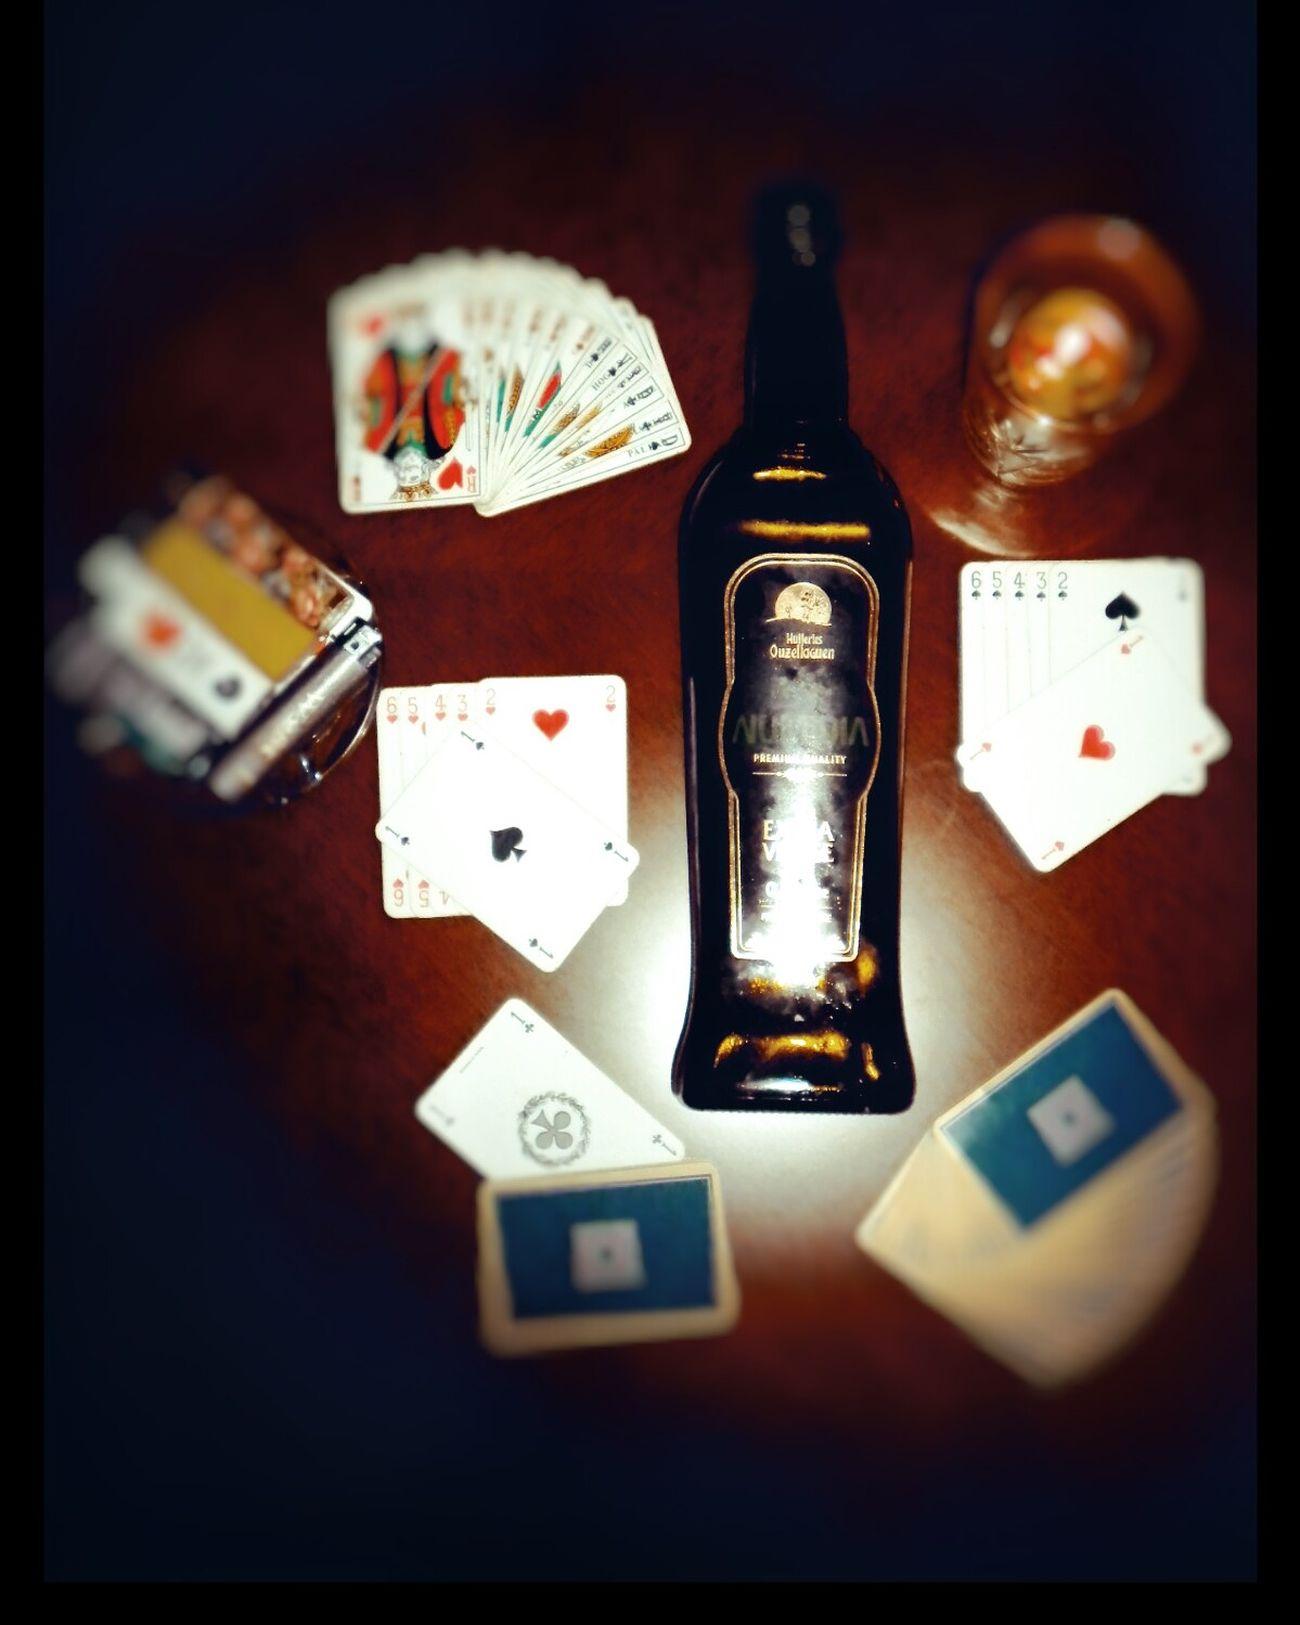 Poker Game Poker Night Drinks Whisky Bar Table Smoke Cigarettes 👌💕 Lifestyles